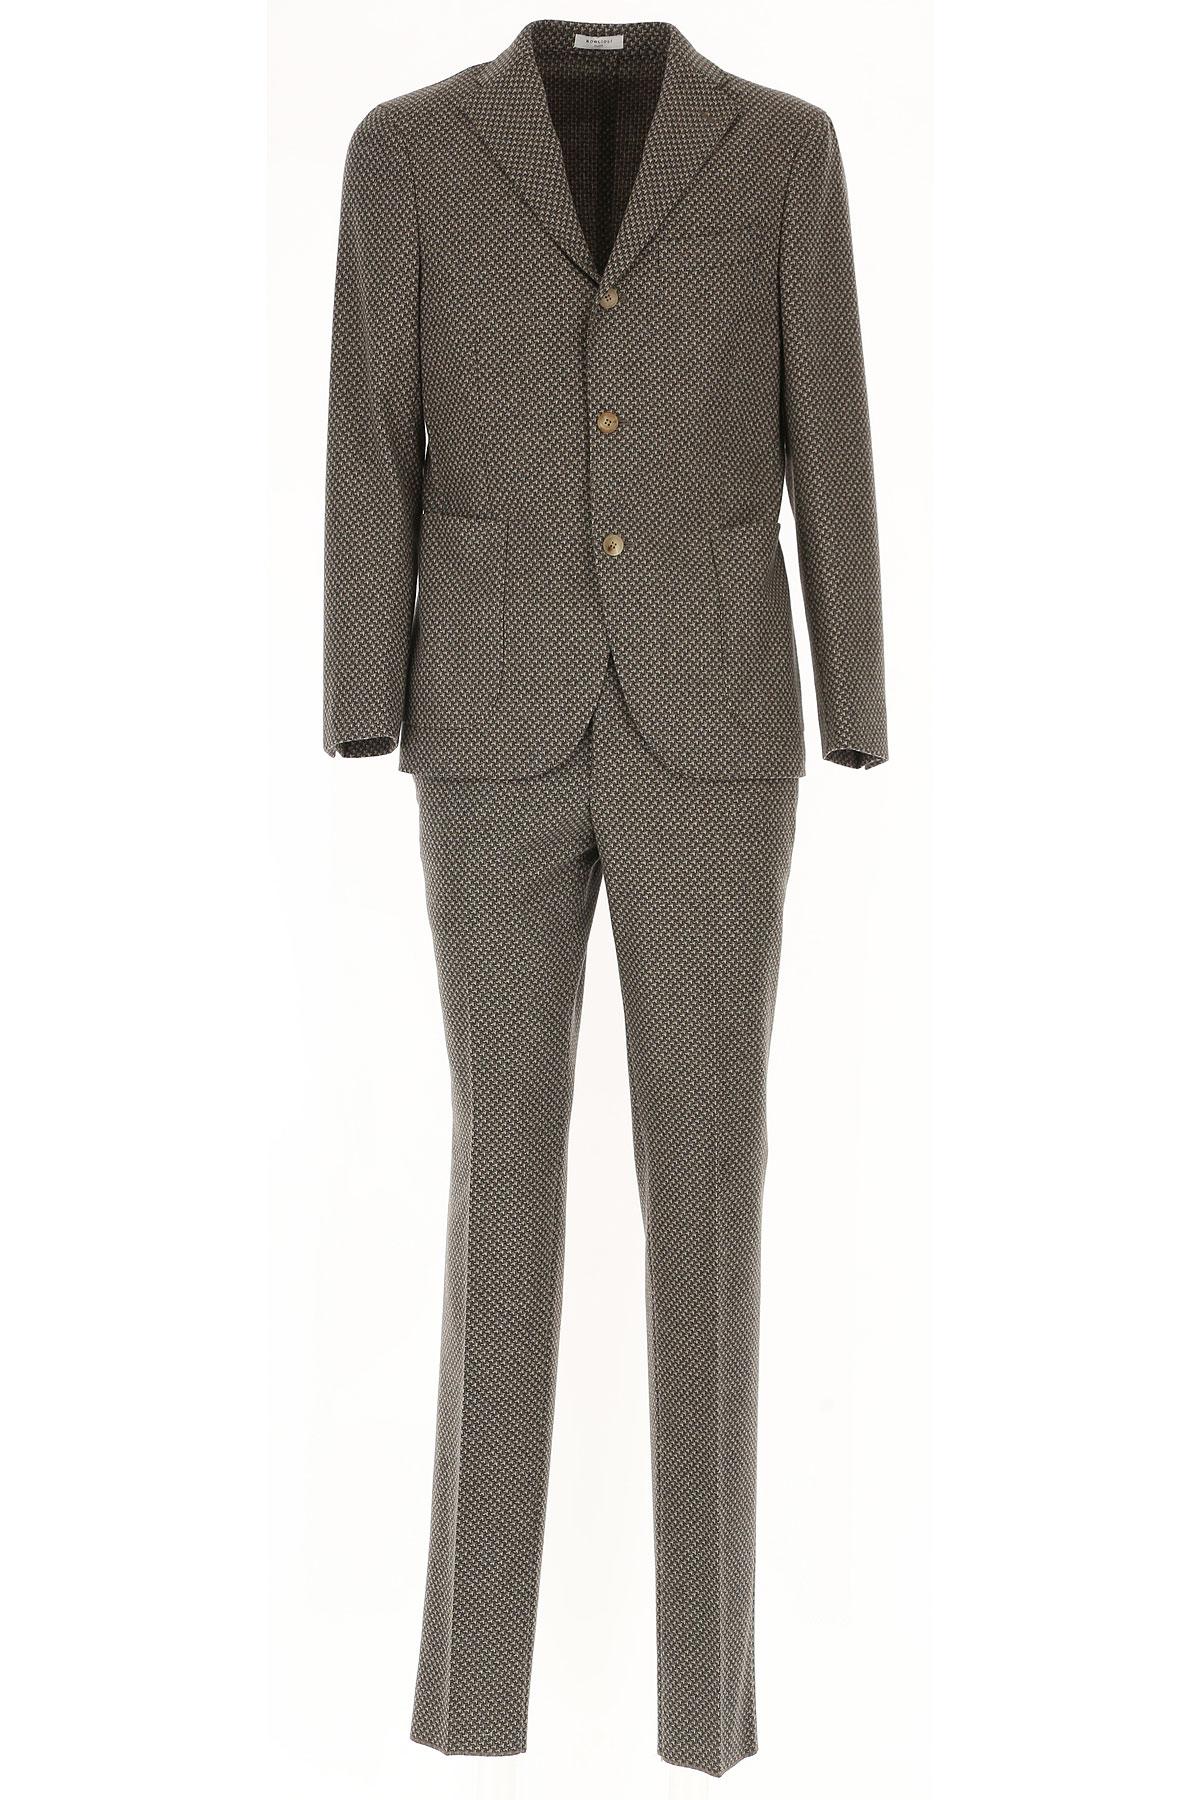 Image of Boglioli Men's Suit, Beige, Wool, 2017, L M XL